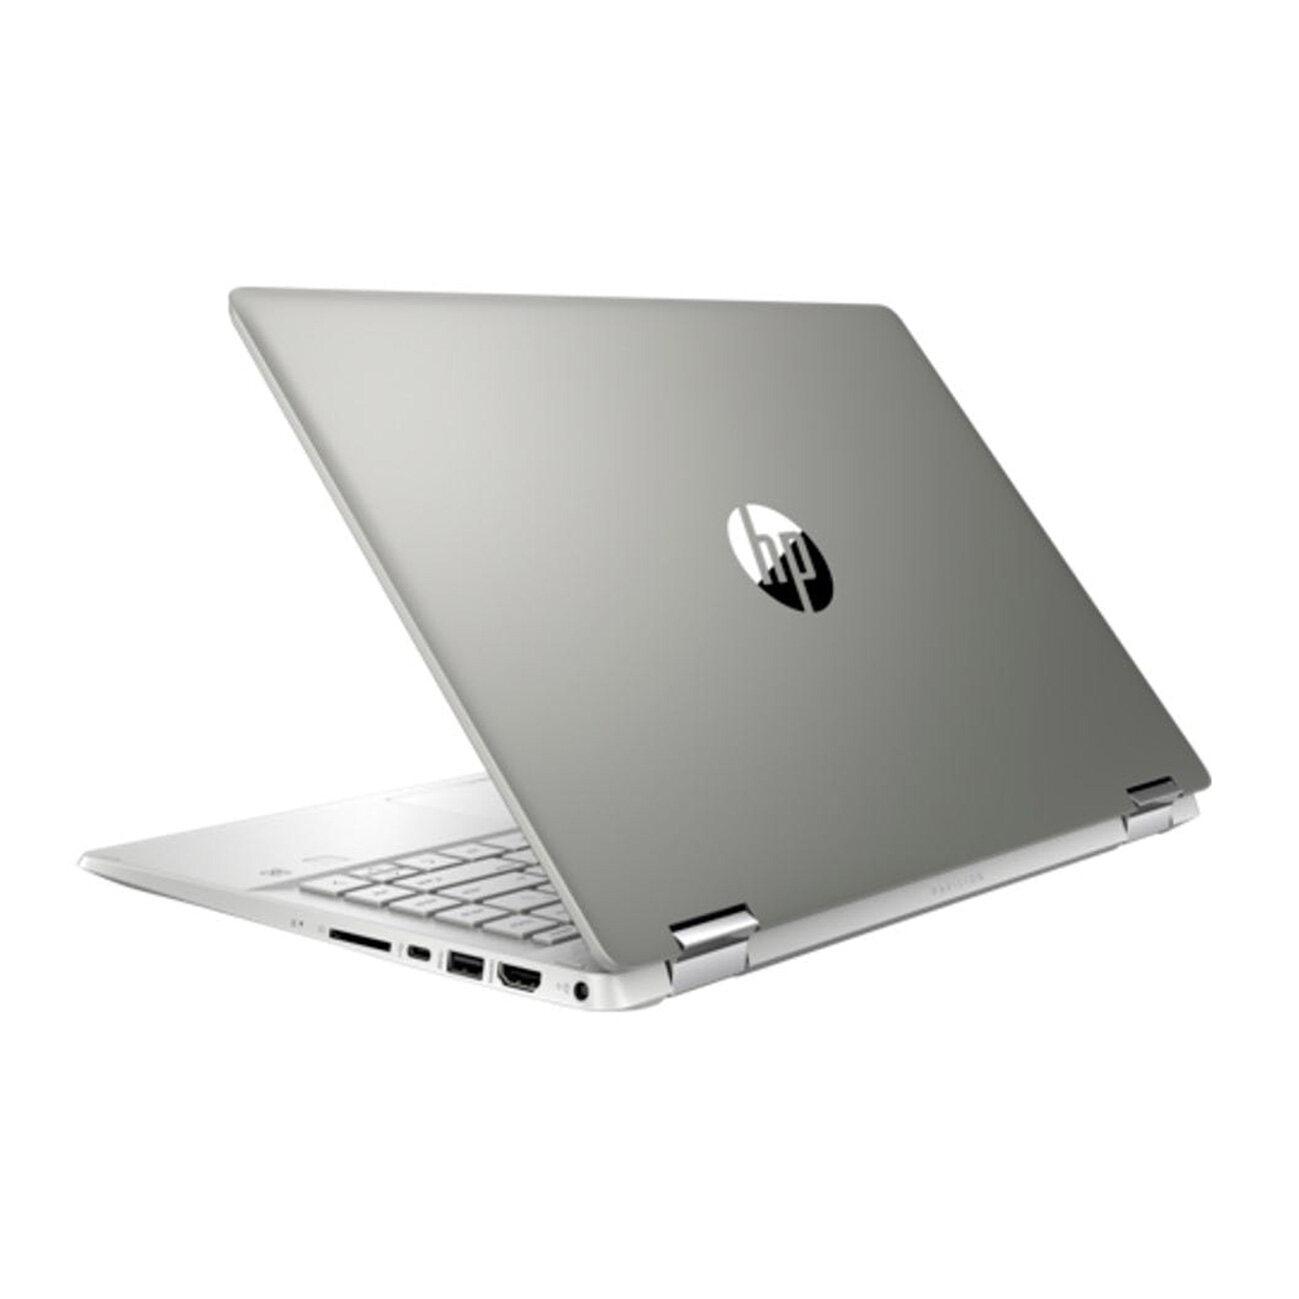 HP Pavilion X36014-DH0041TX Touch Laptop - i5-8265U W10 14  FHD IPS 4GB 256GB SSD MX130 2GB Malaysia